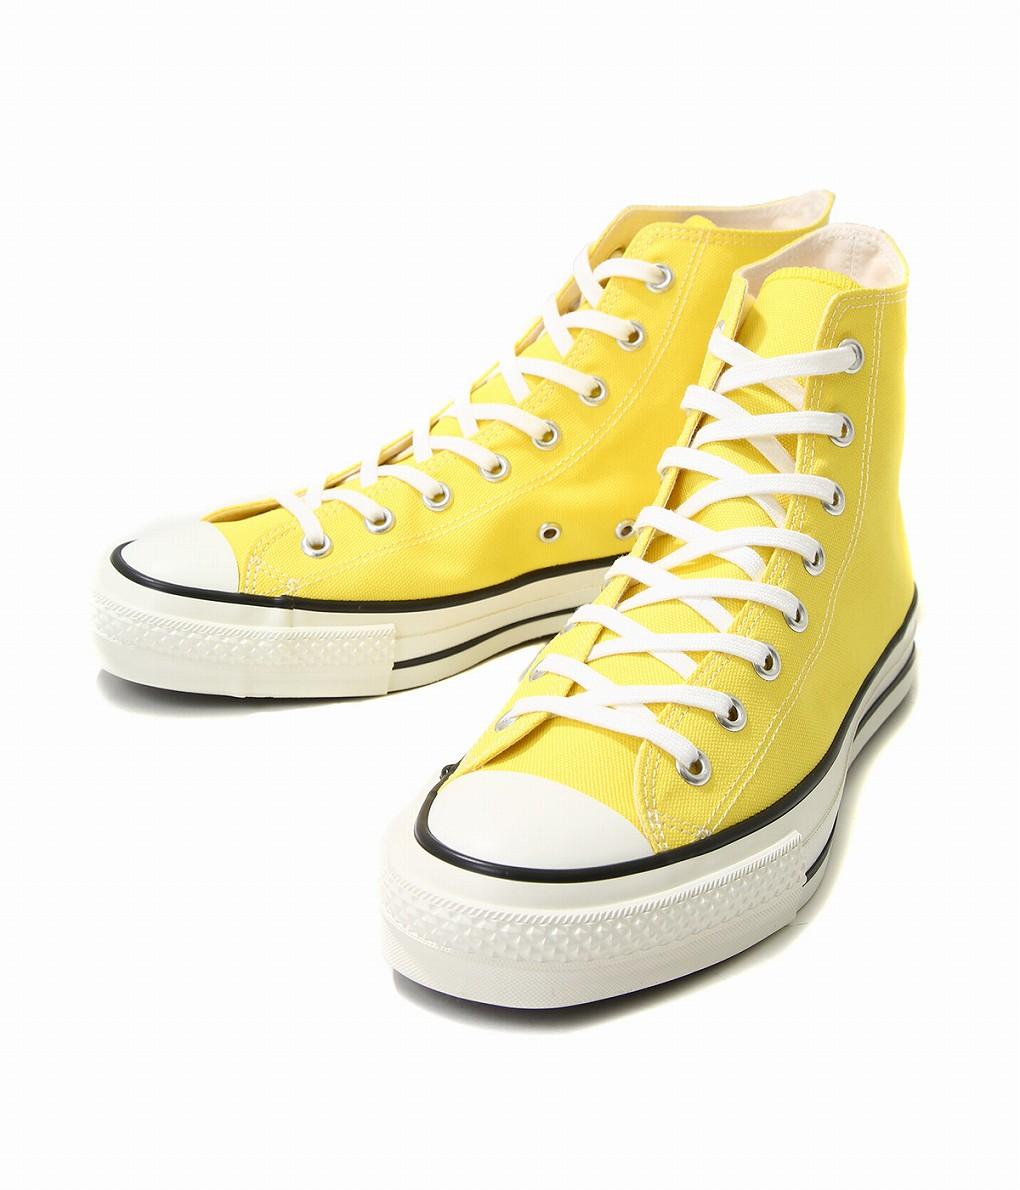 CONVERSE / コンバース : CANVAS ALL STAR J HI : コンバース オールスター シューズ 靴 スニーカー ハイカット メイドインジャパン : 32965133 【AST】